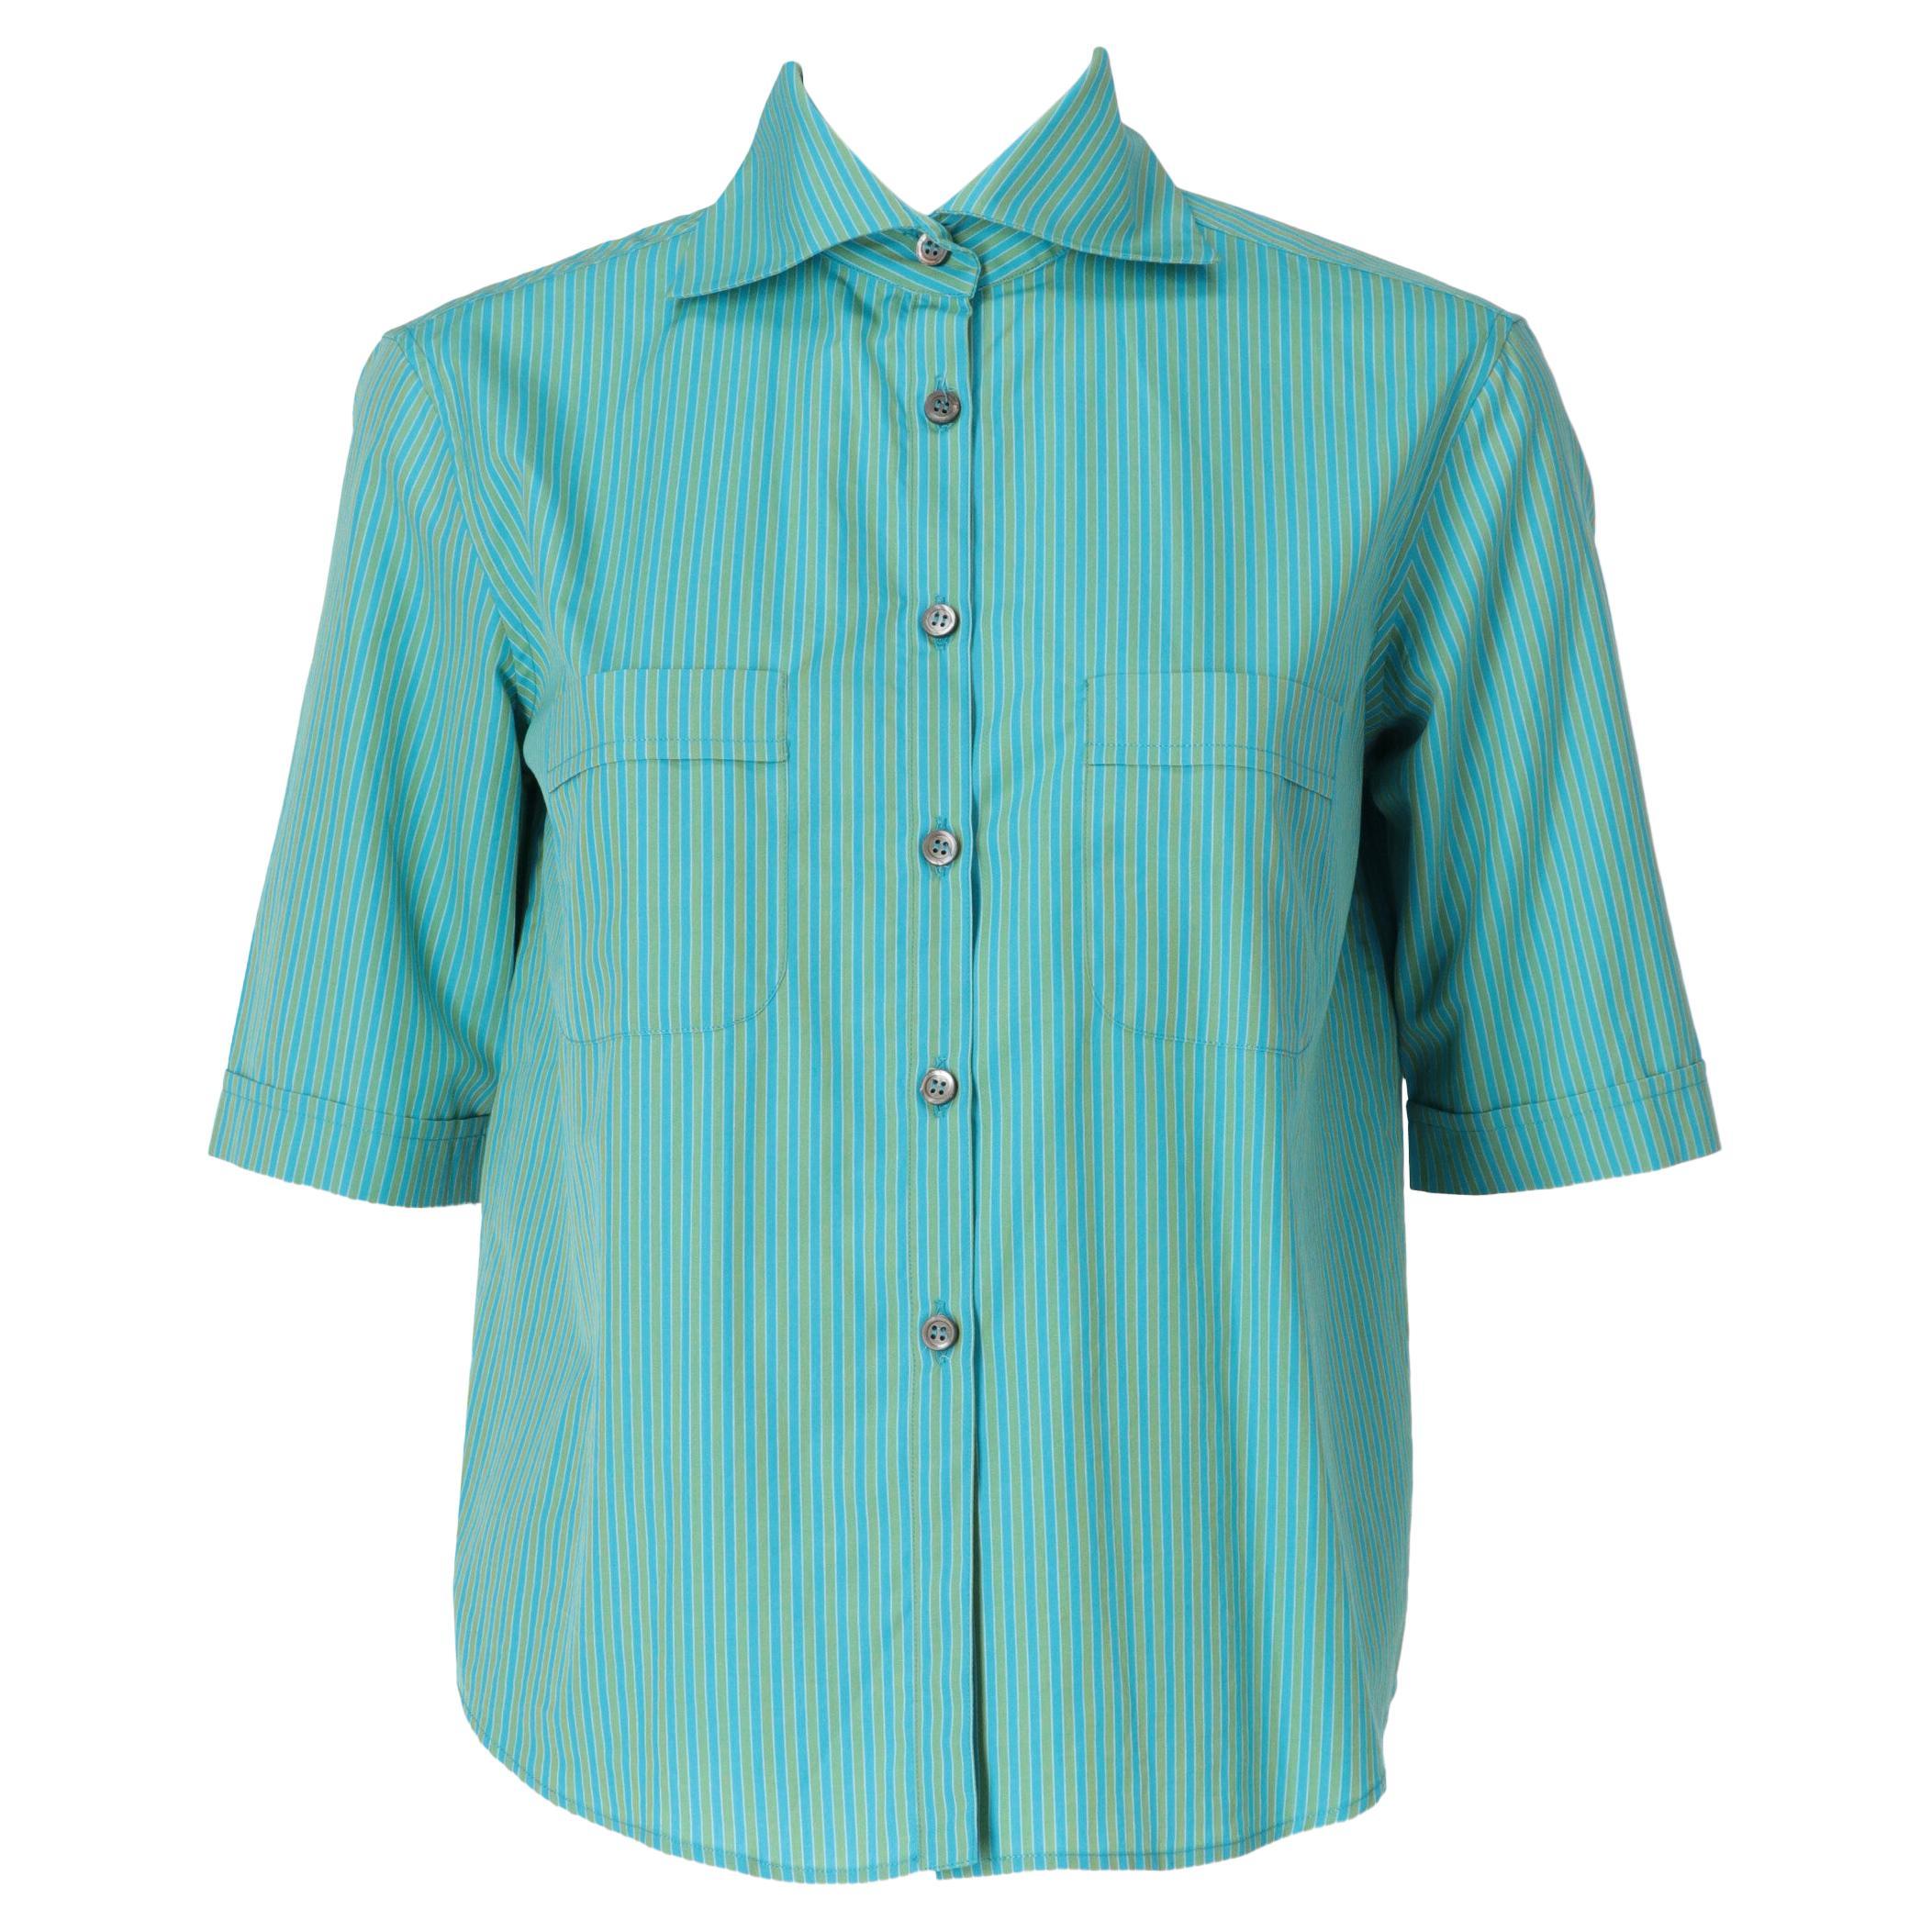 1990s Romeo Gigli Striped Shirt